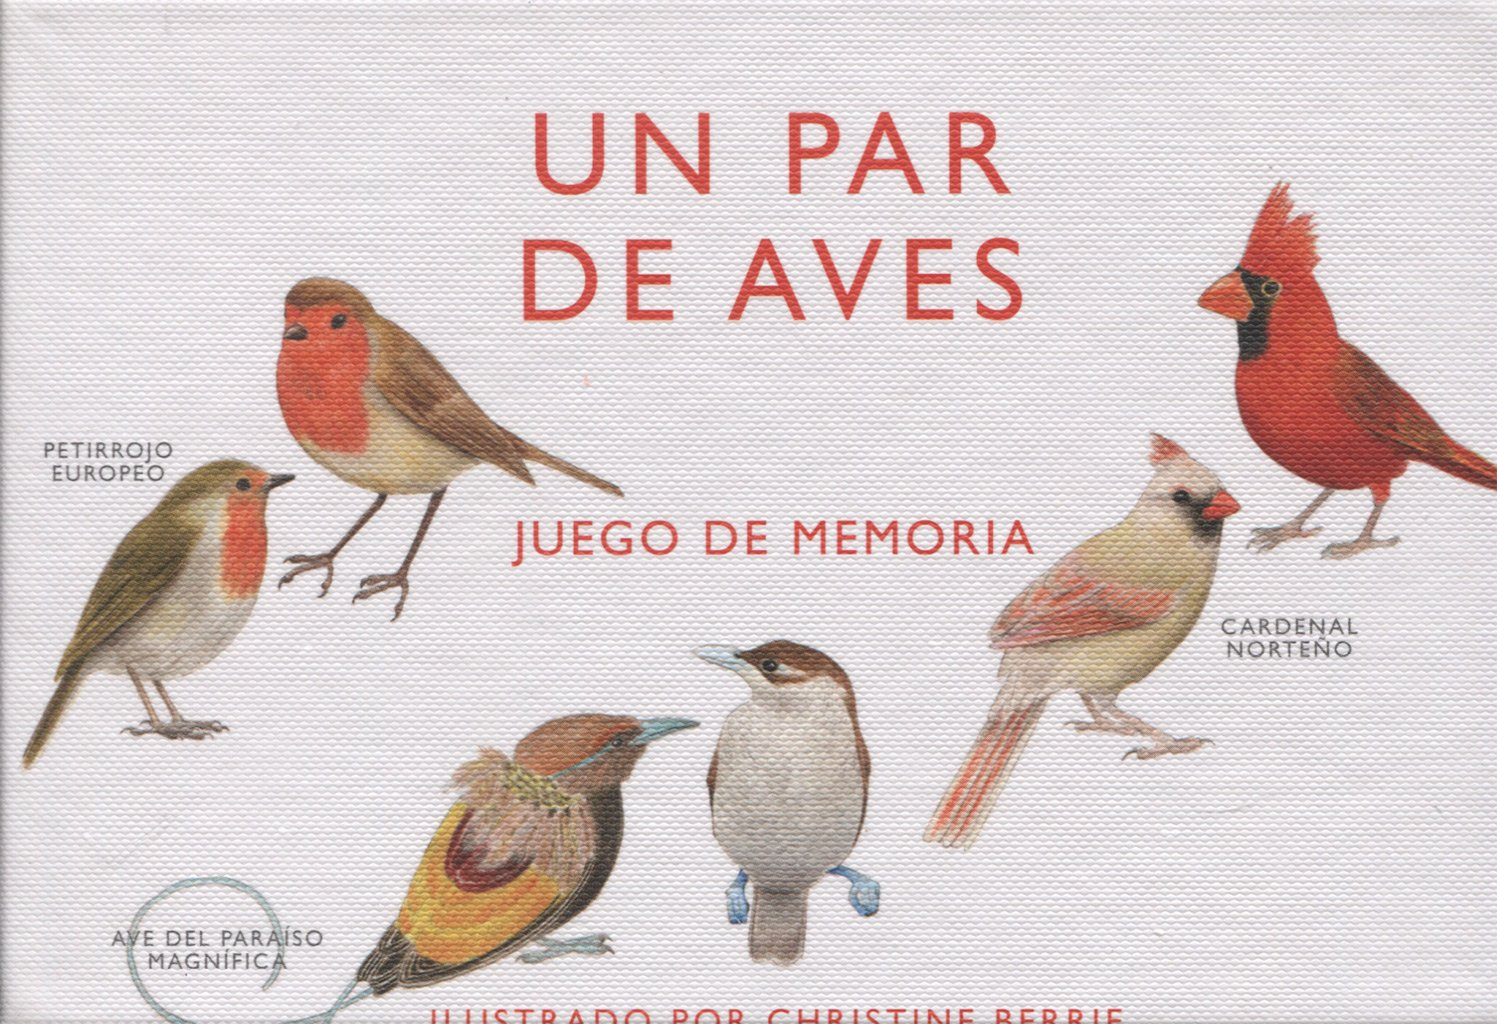 Un par de aves. Juego de memoria: Amazon.es: Christine Berrie, Christine Berrie: Libros